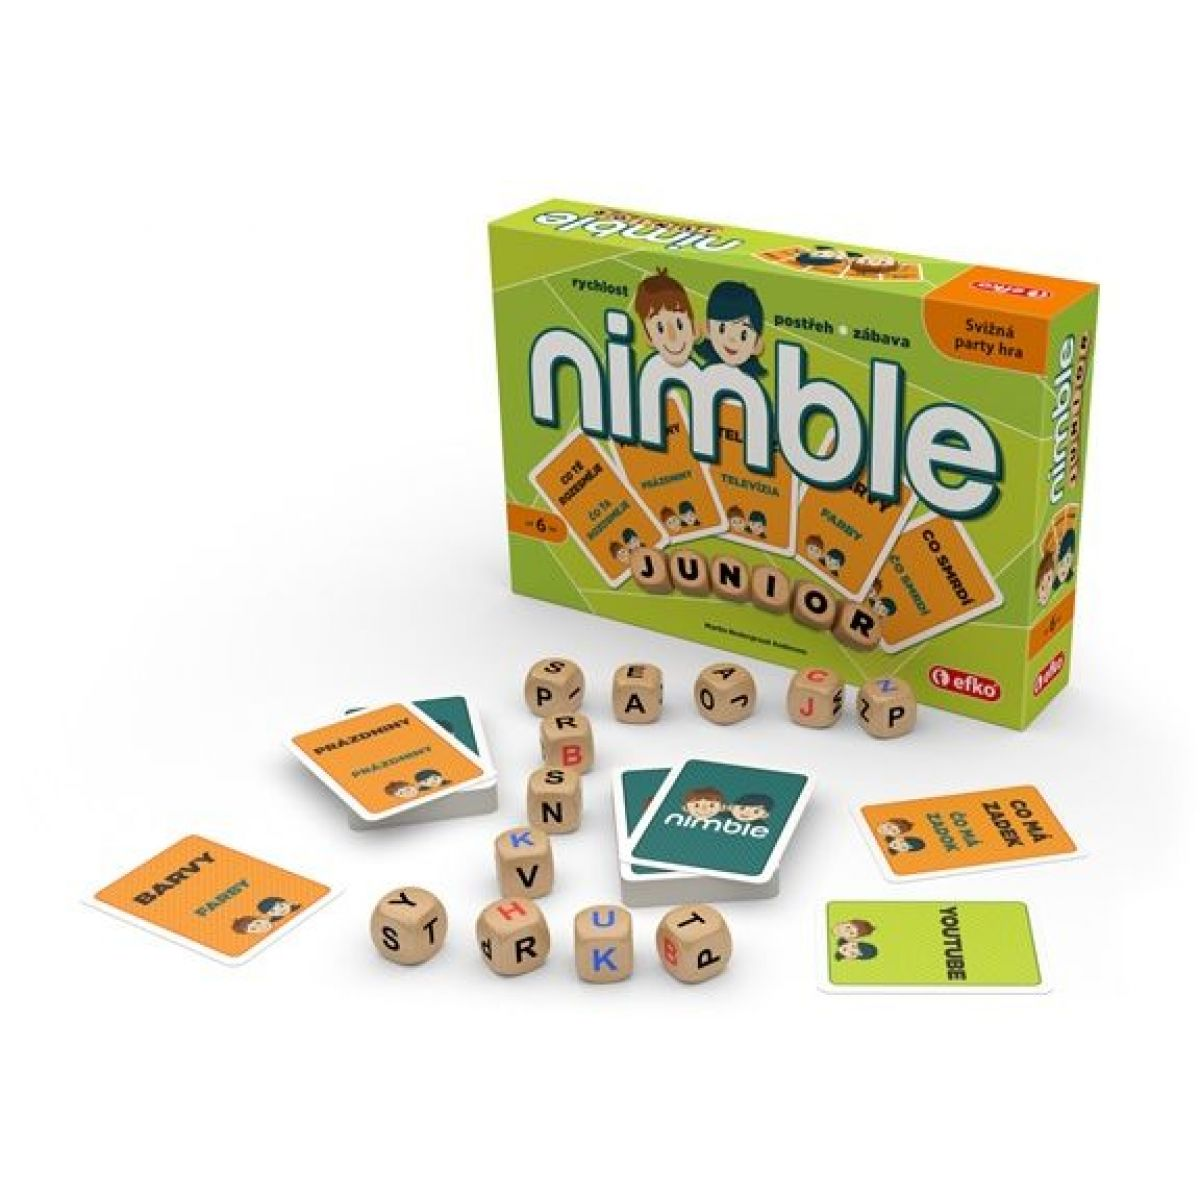 Efko Nimble Junior párty hra pre deti